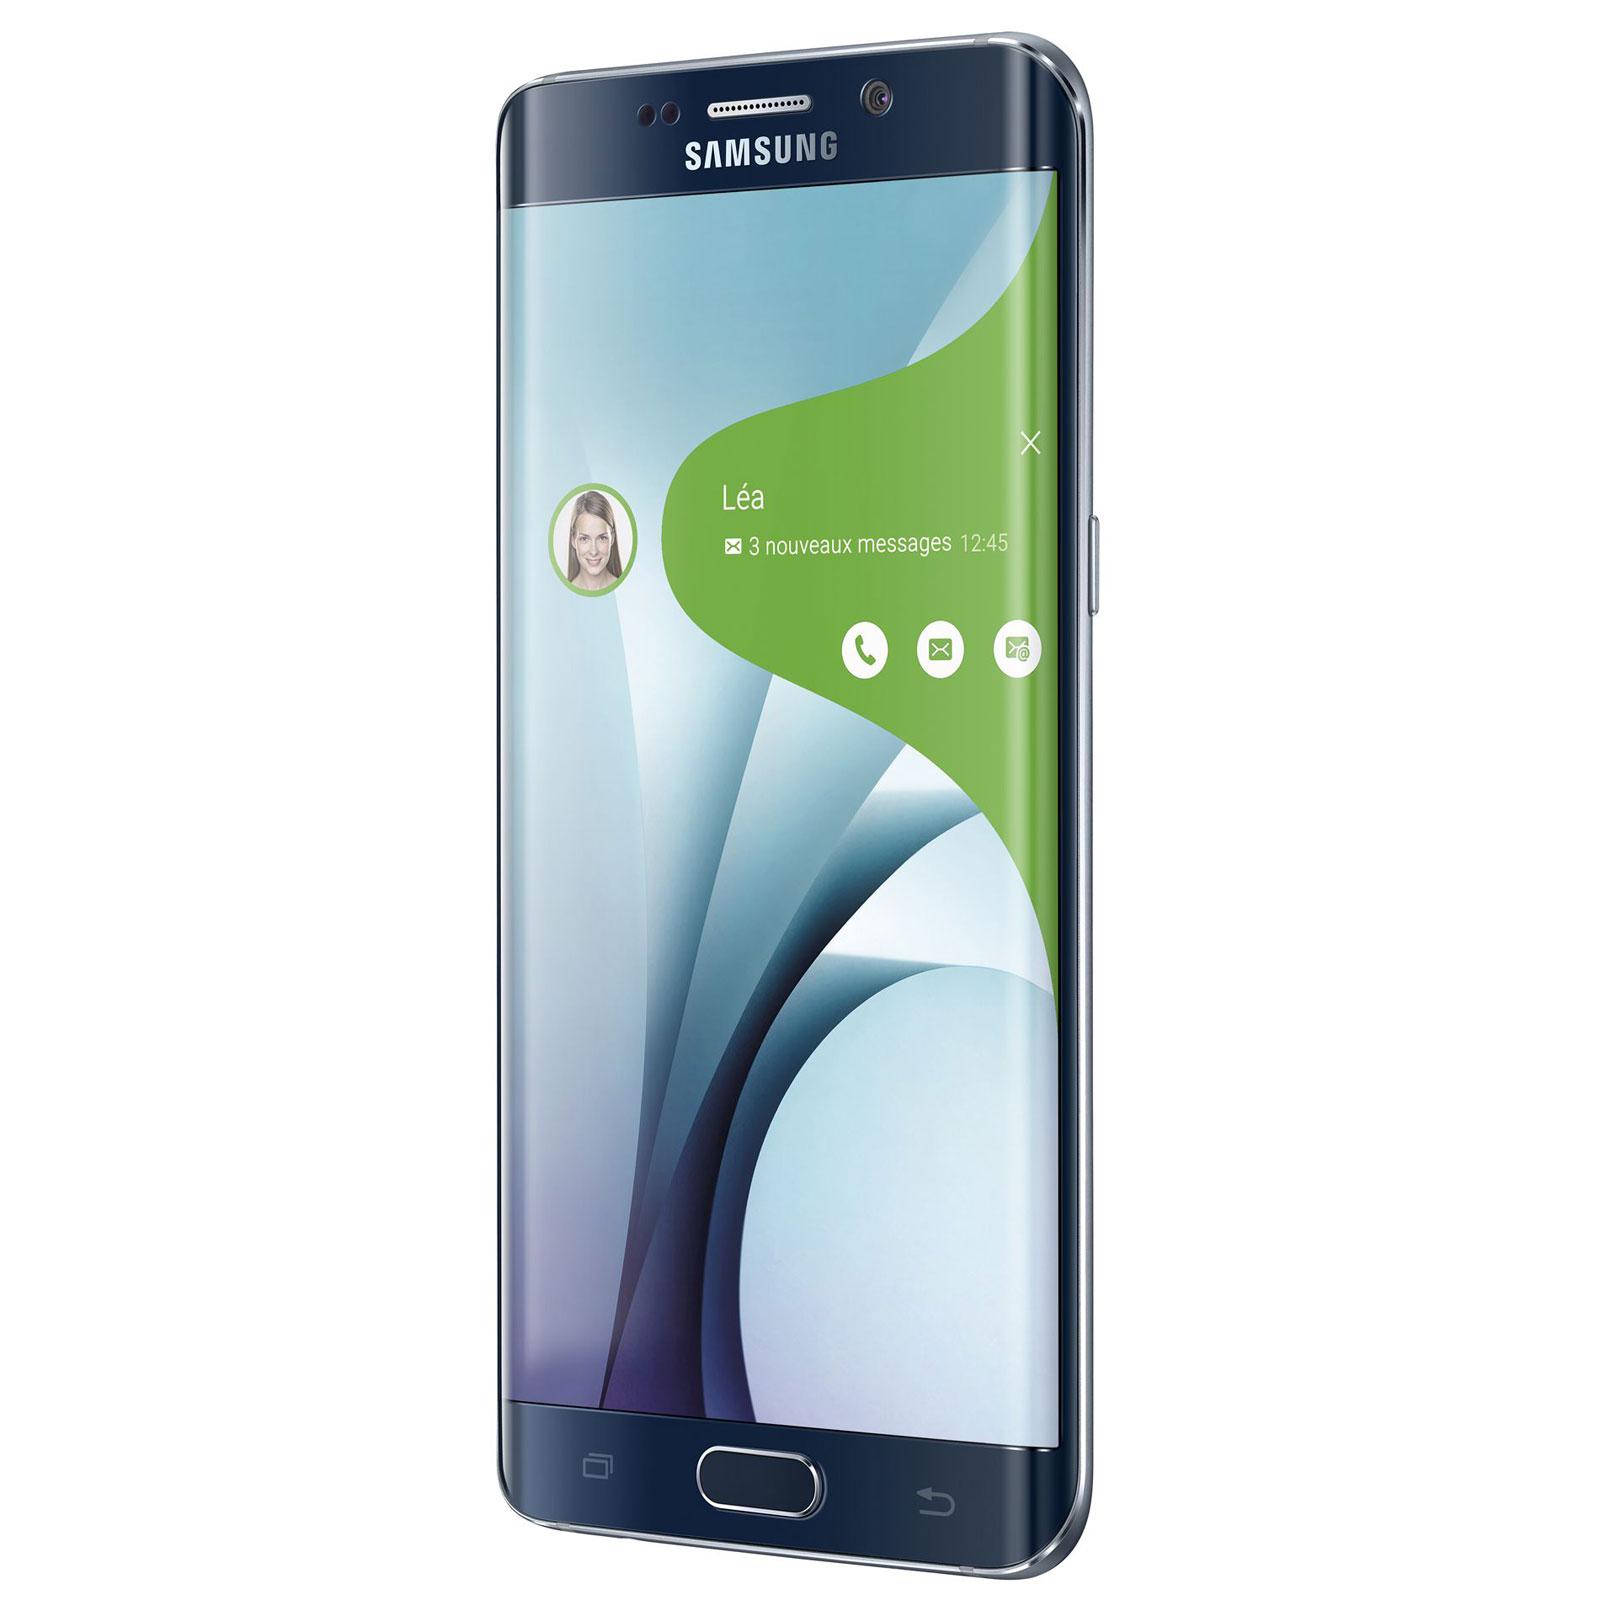 samsung galaxy s6 edge sm g928f noir 32 go mobile smartphone samsung sur. Black Bedroom Furniture Sets. Home Design Ideas